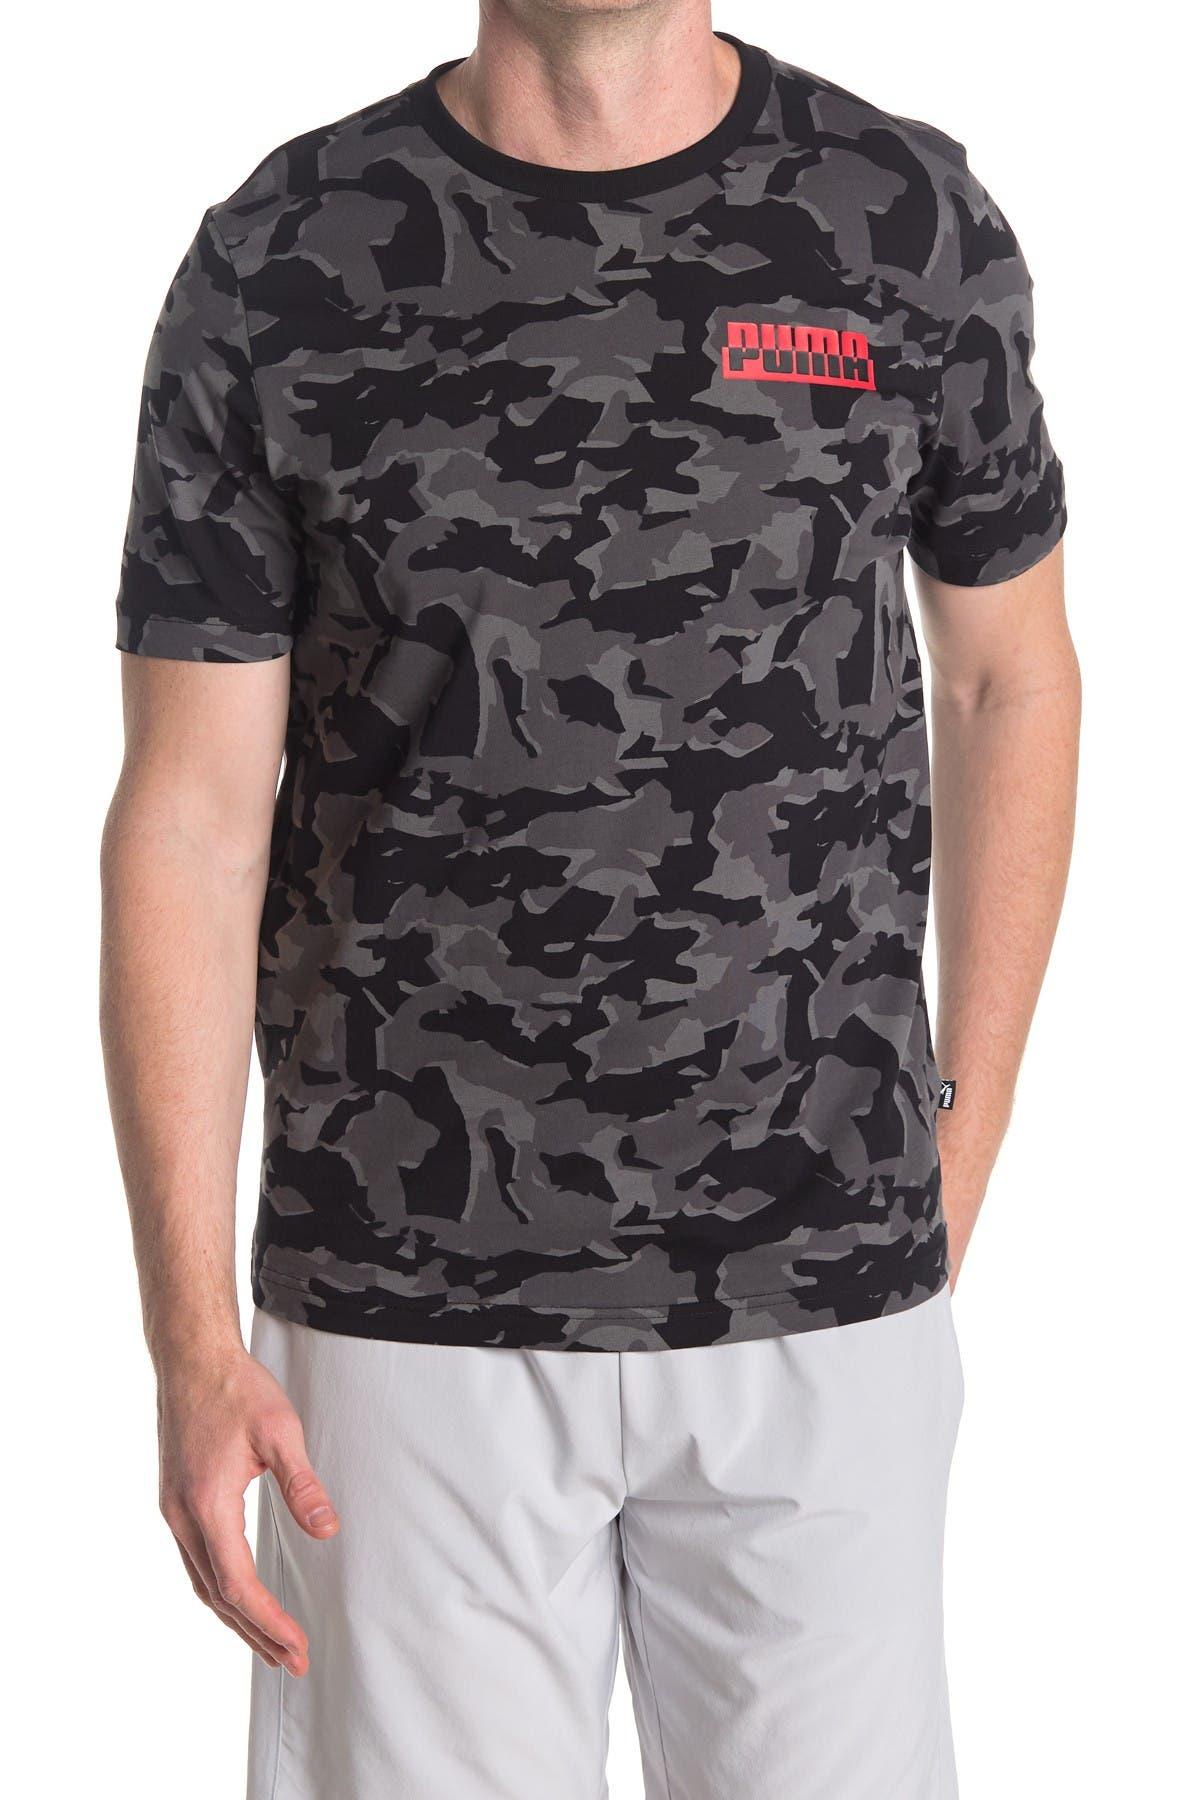 Image of PUMA Core Camo T-Shirt